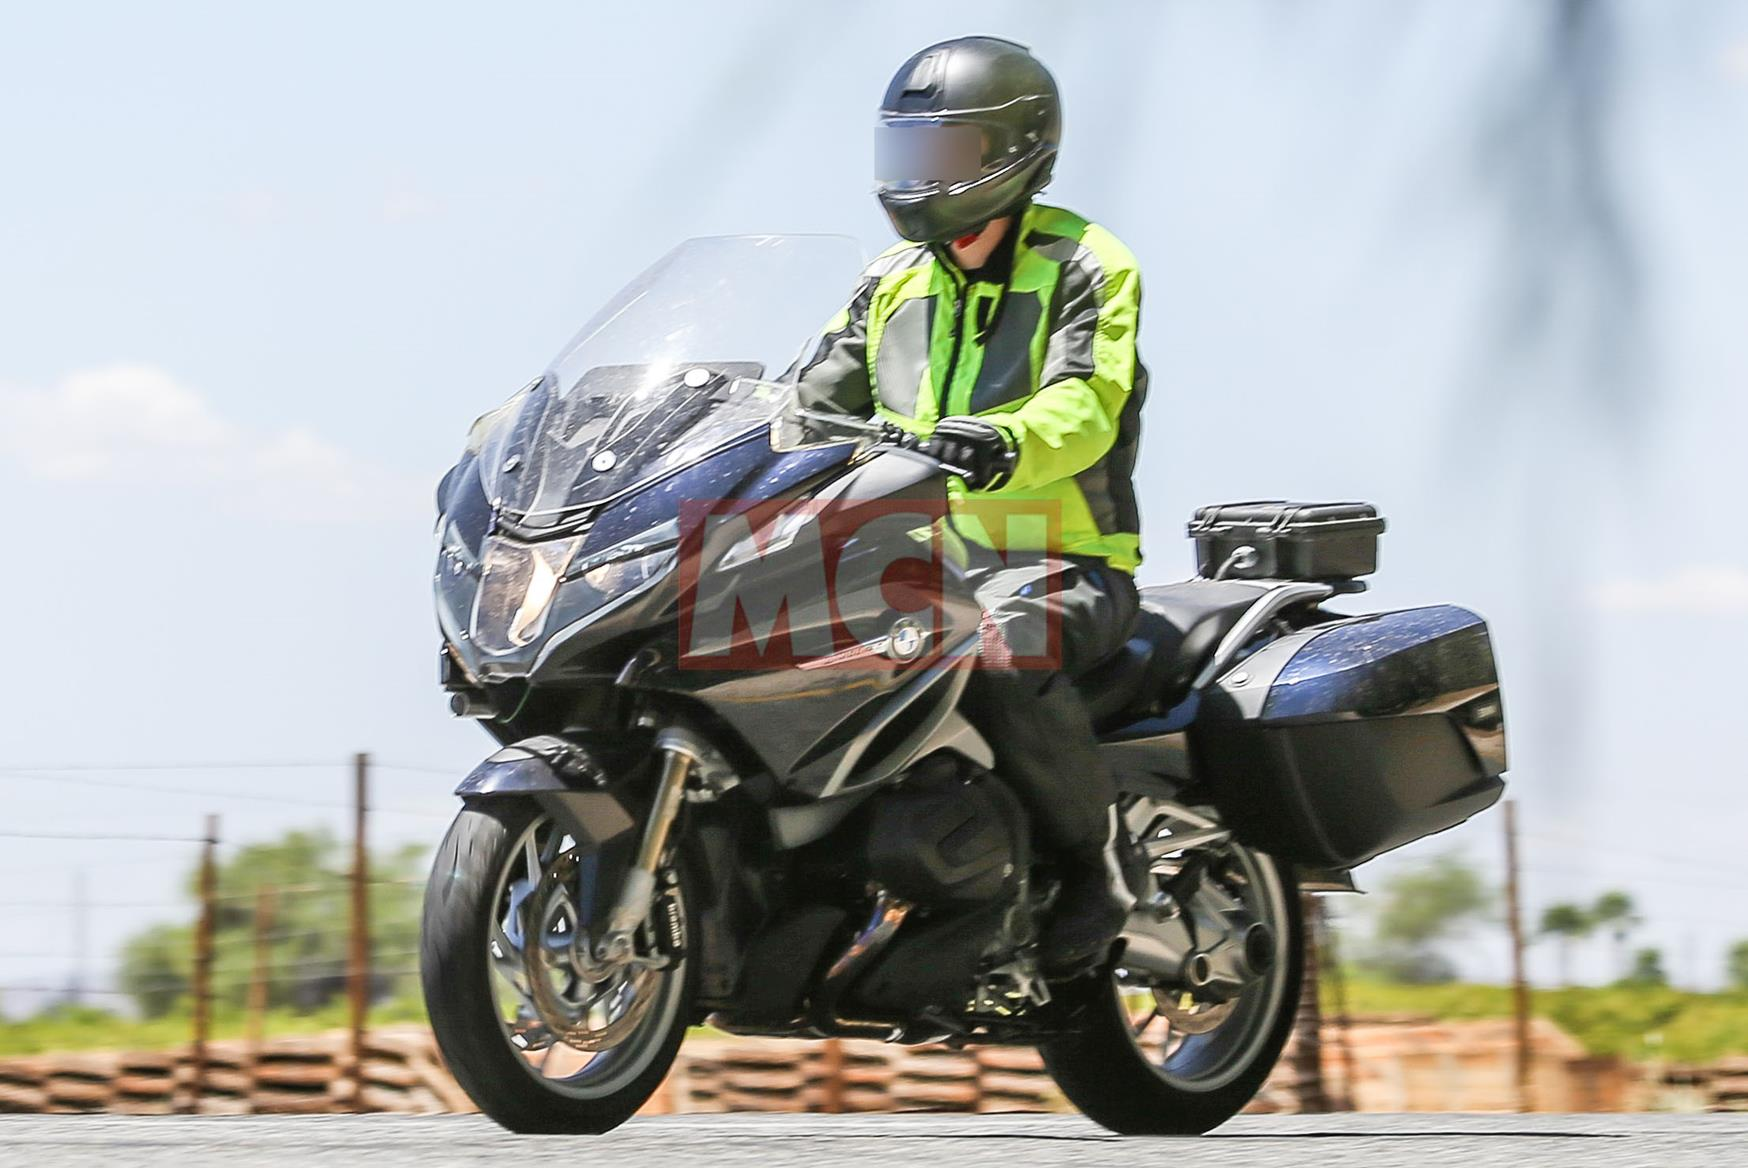 BMW-R1200-RT-1.jpg?mode=max&quality=90&s